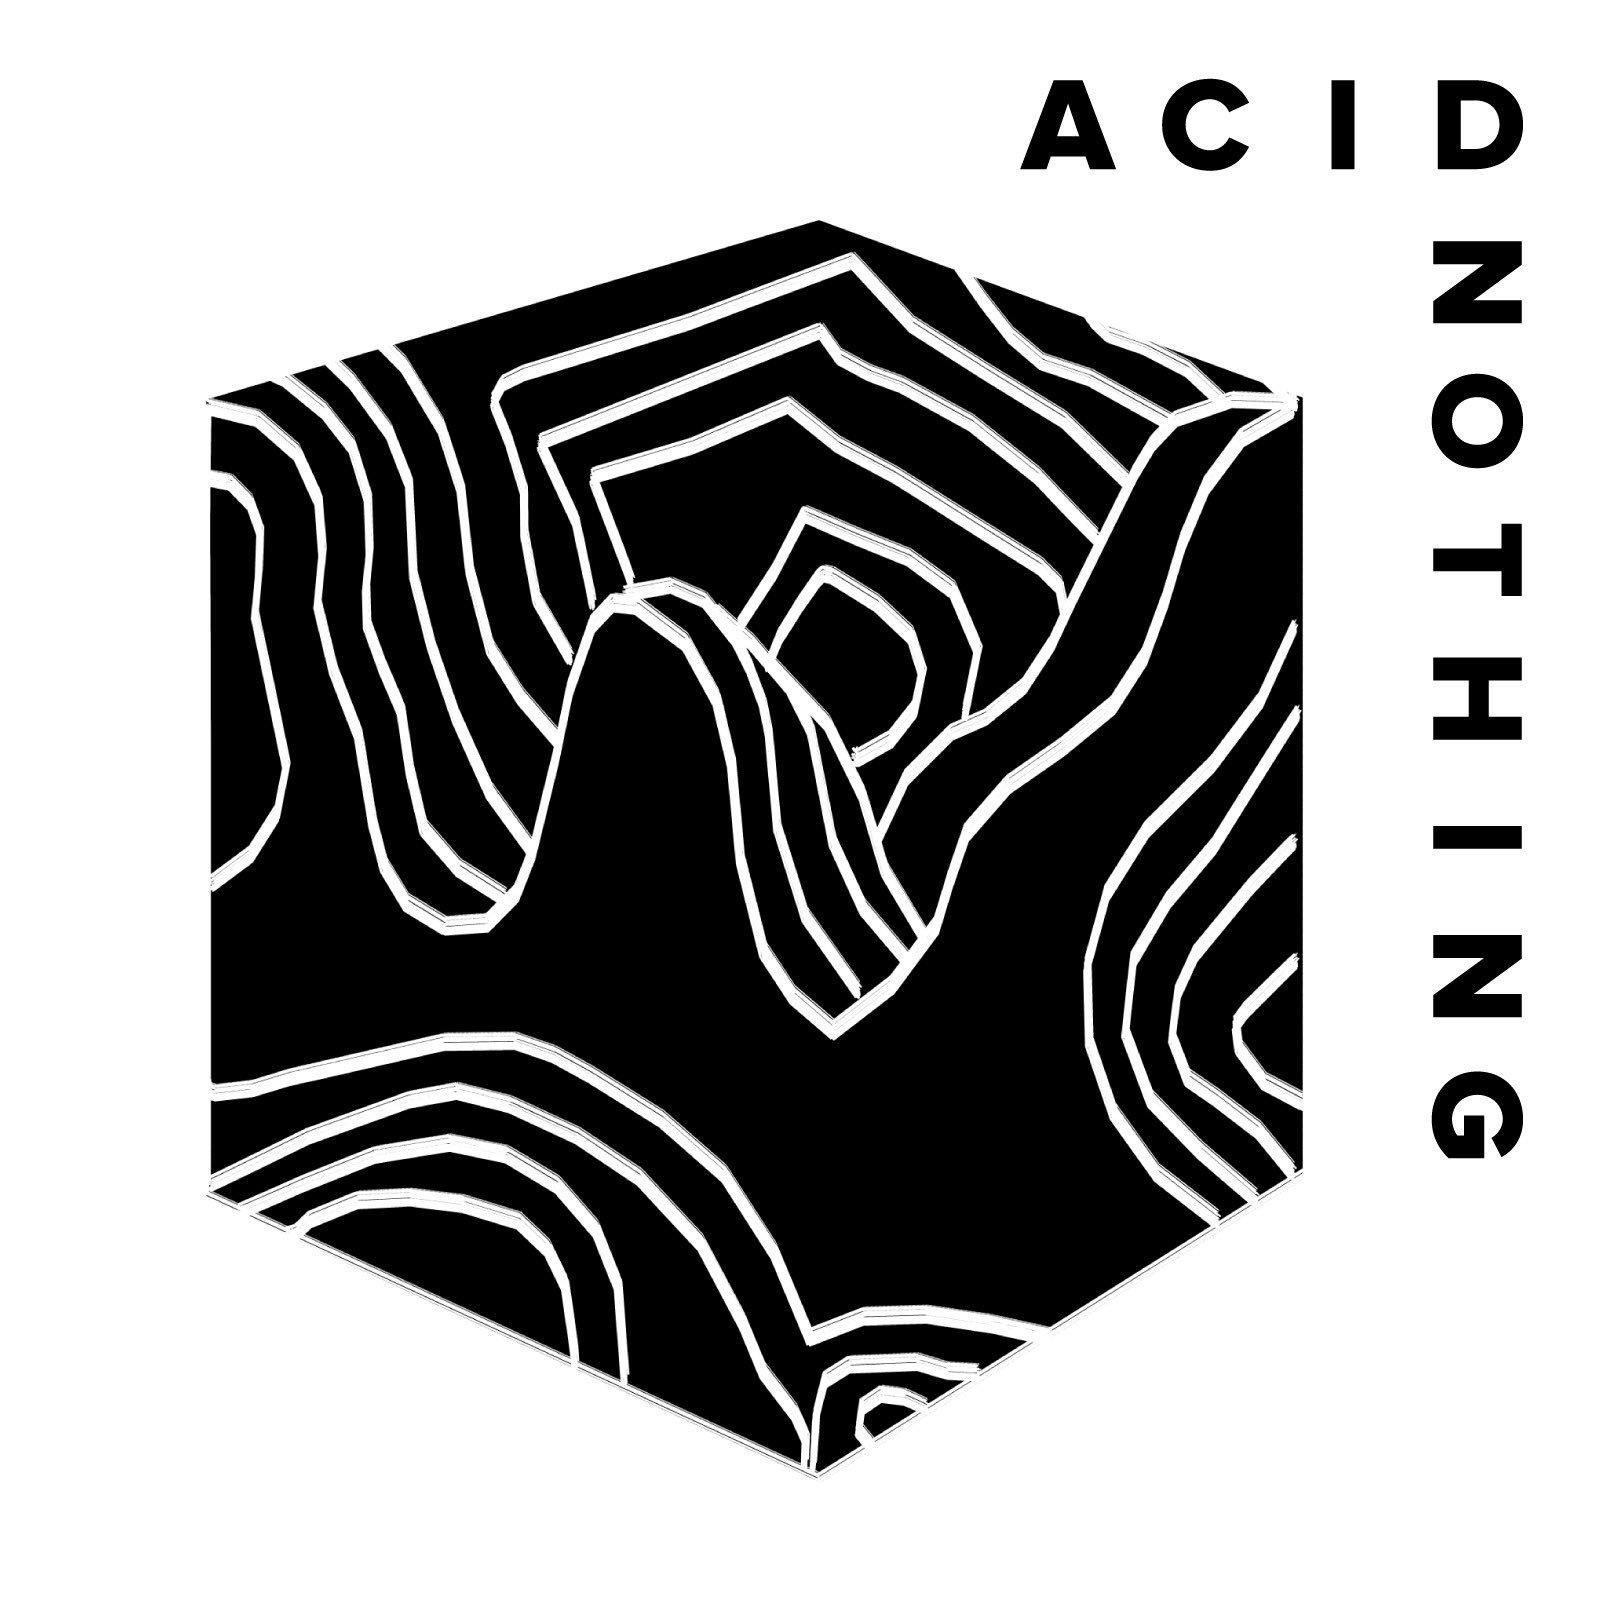 acidnothing.jpg